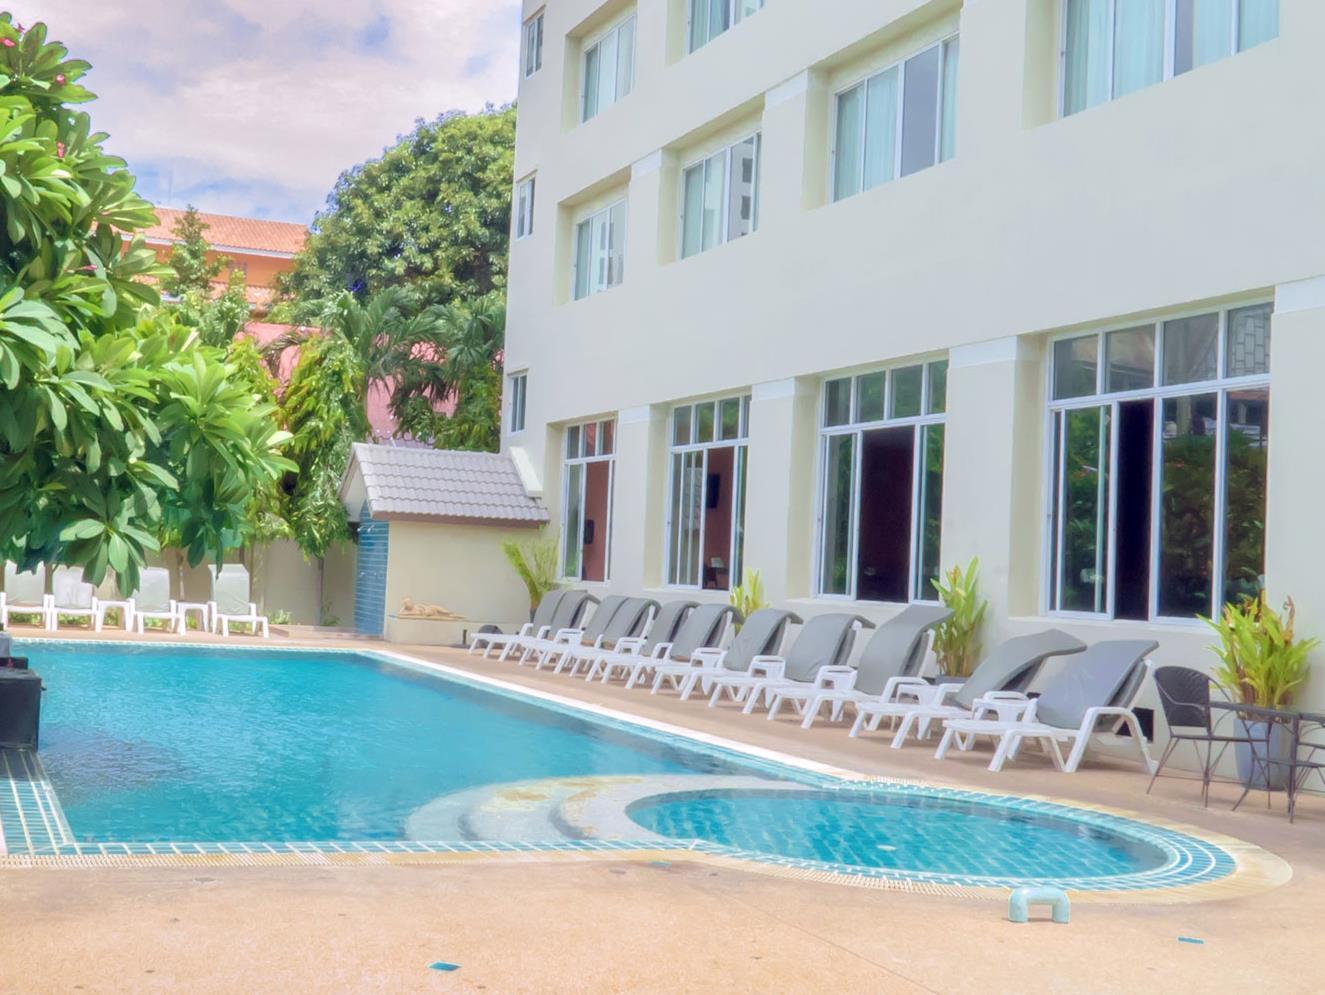 Crown Pattaya Beach Hotel โรงแรม คราวน์ พัทยา บีช